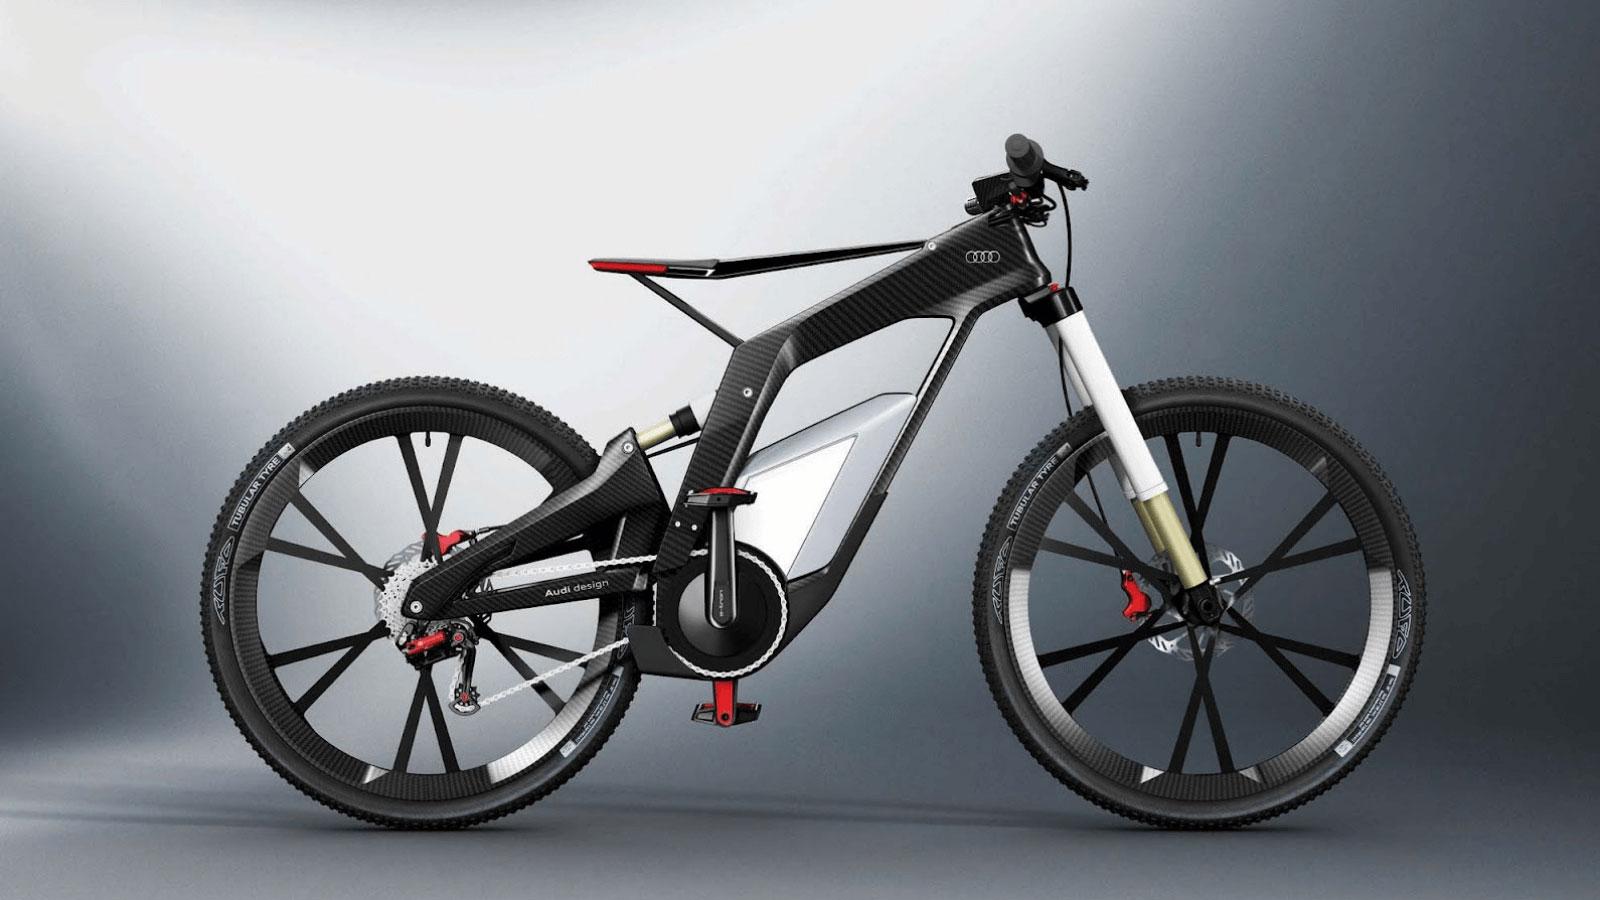 Many Benefits of Motorized Bicycles